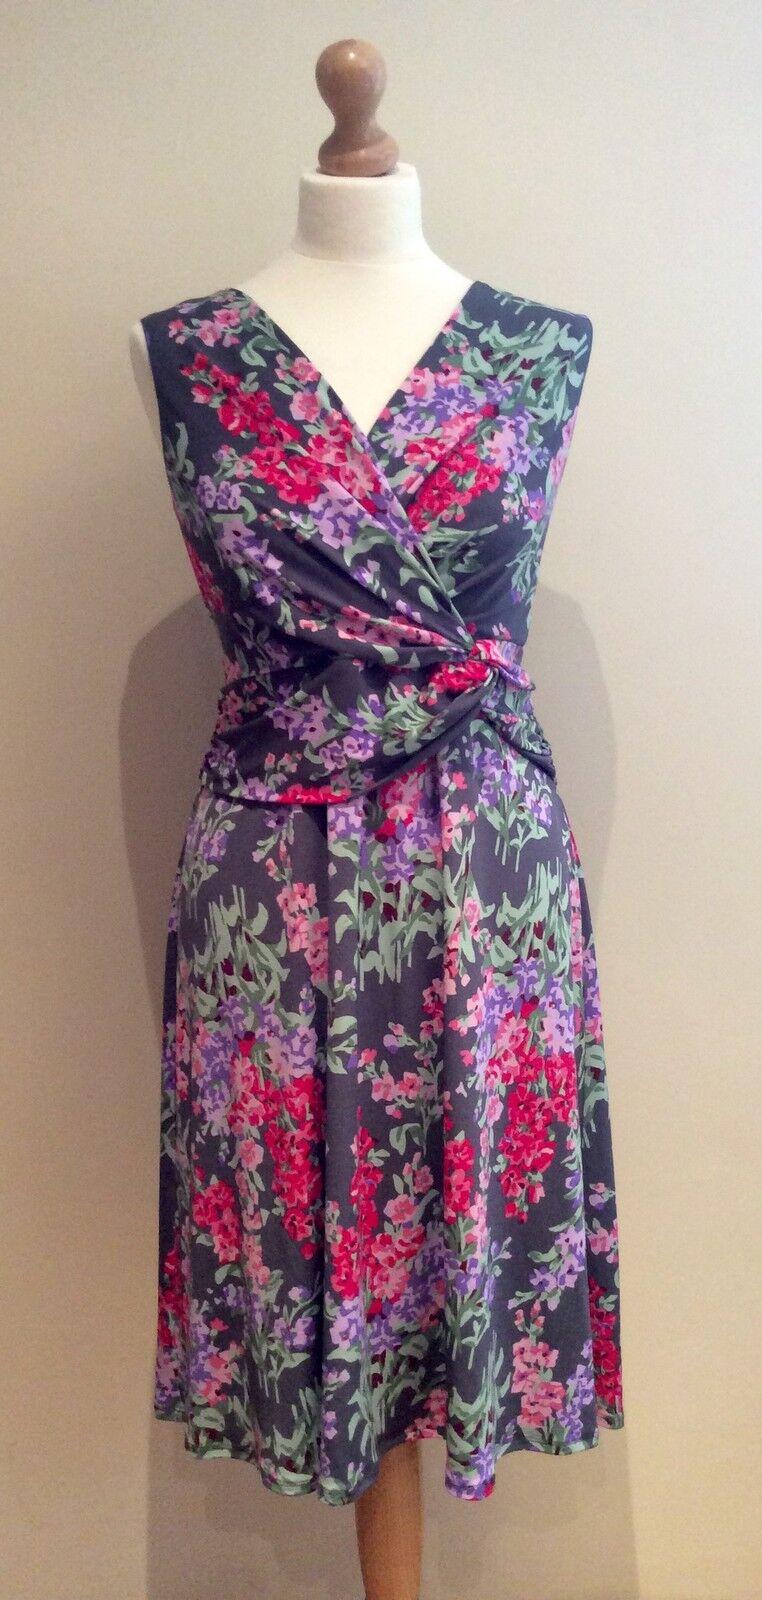 LAURA ASHLEY OCCASION SIZE 14 GREY STRETCH FLORAL DRESS